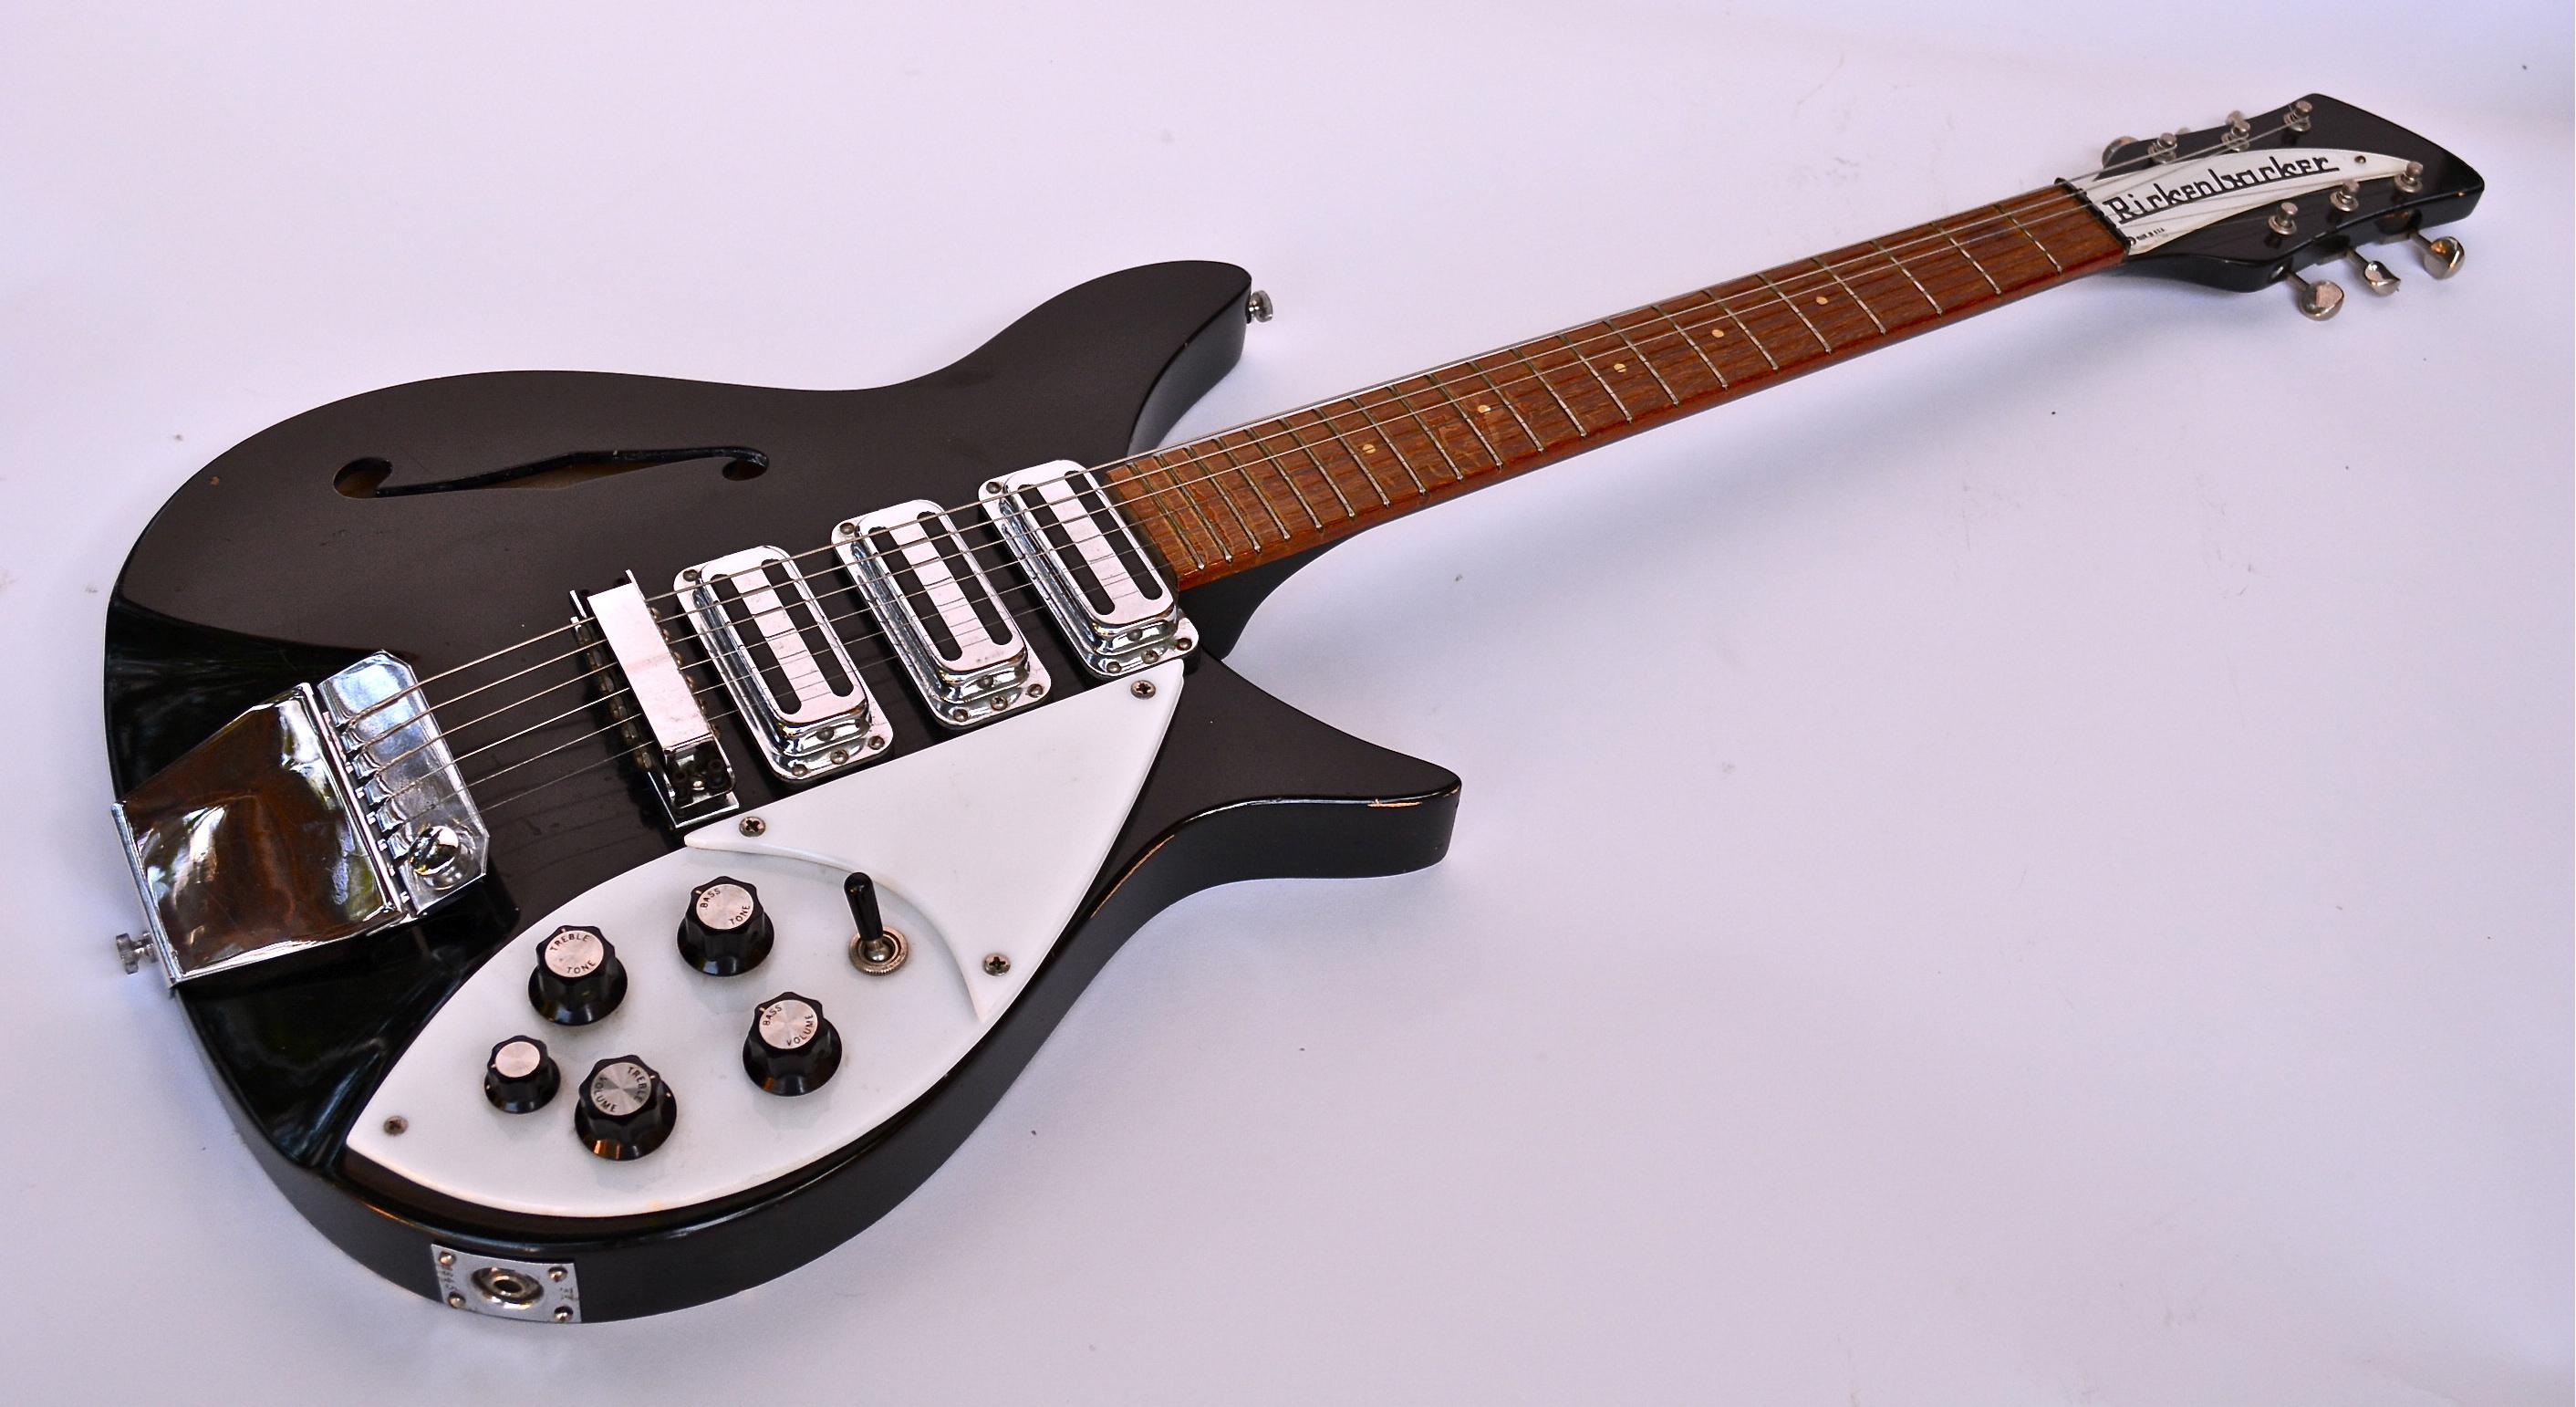 1966 Rickenbacker 325 (John Lennon)